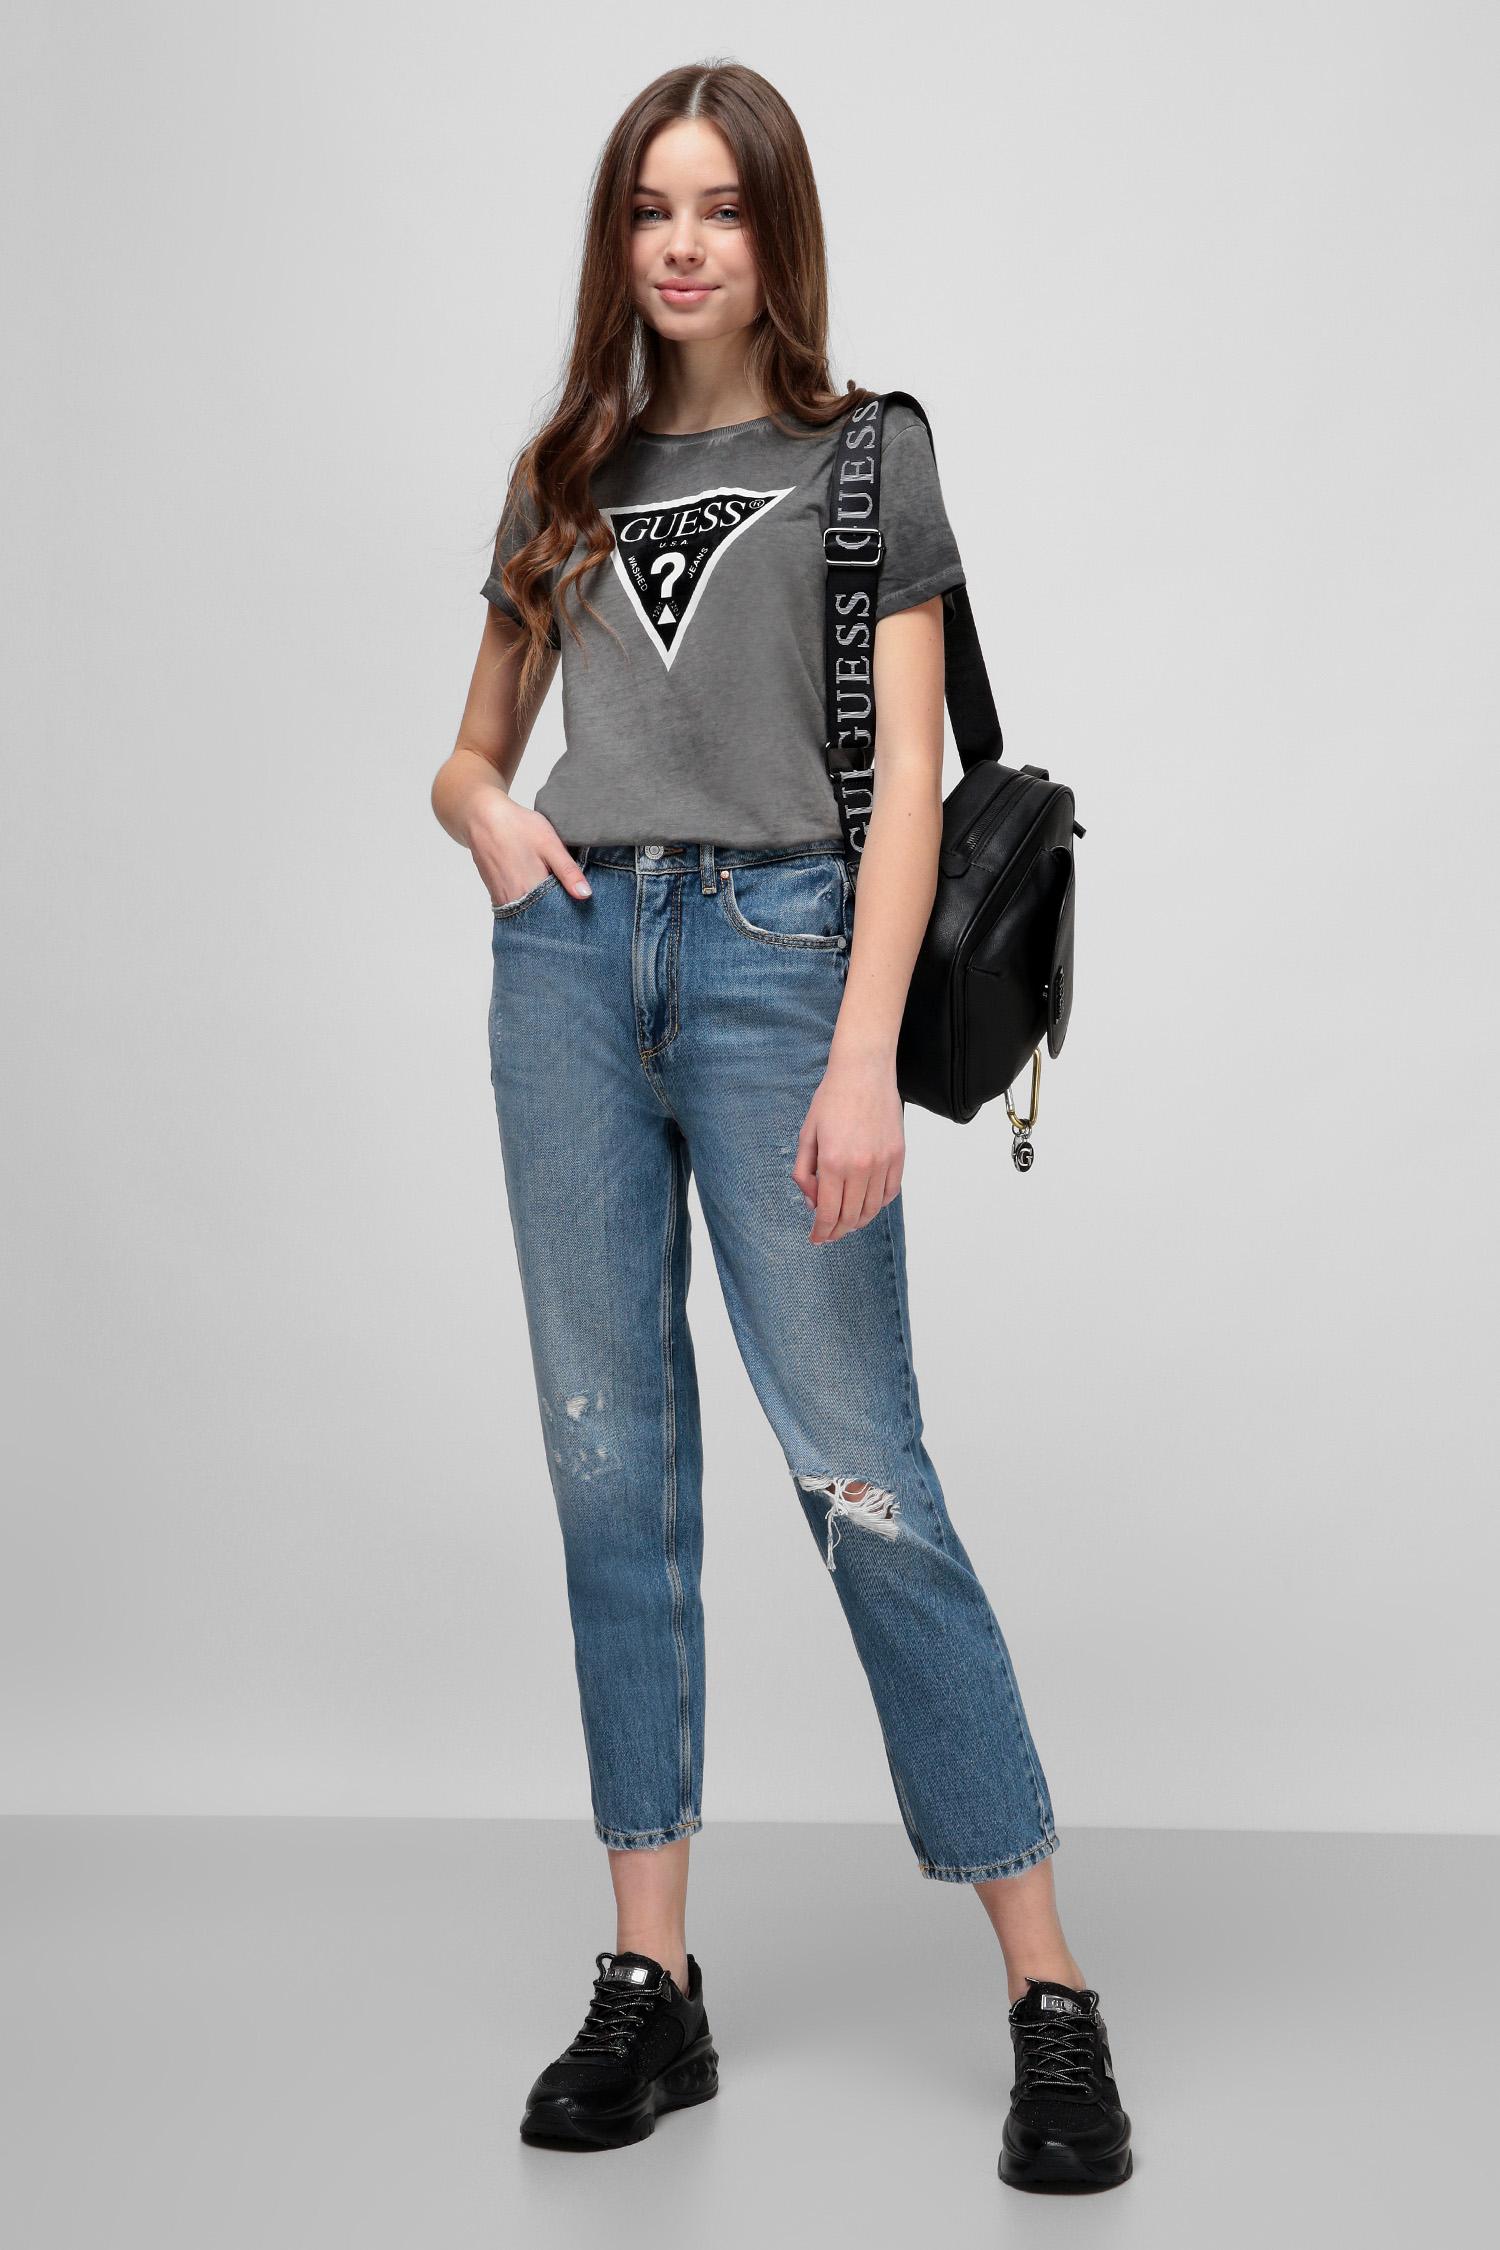 Темно-серая футболка для девушек Guess W0YI13.R5JK1;JBLK